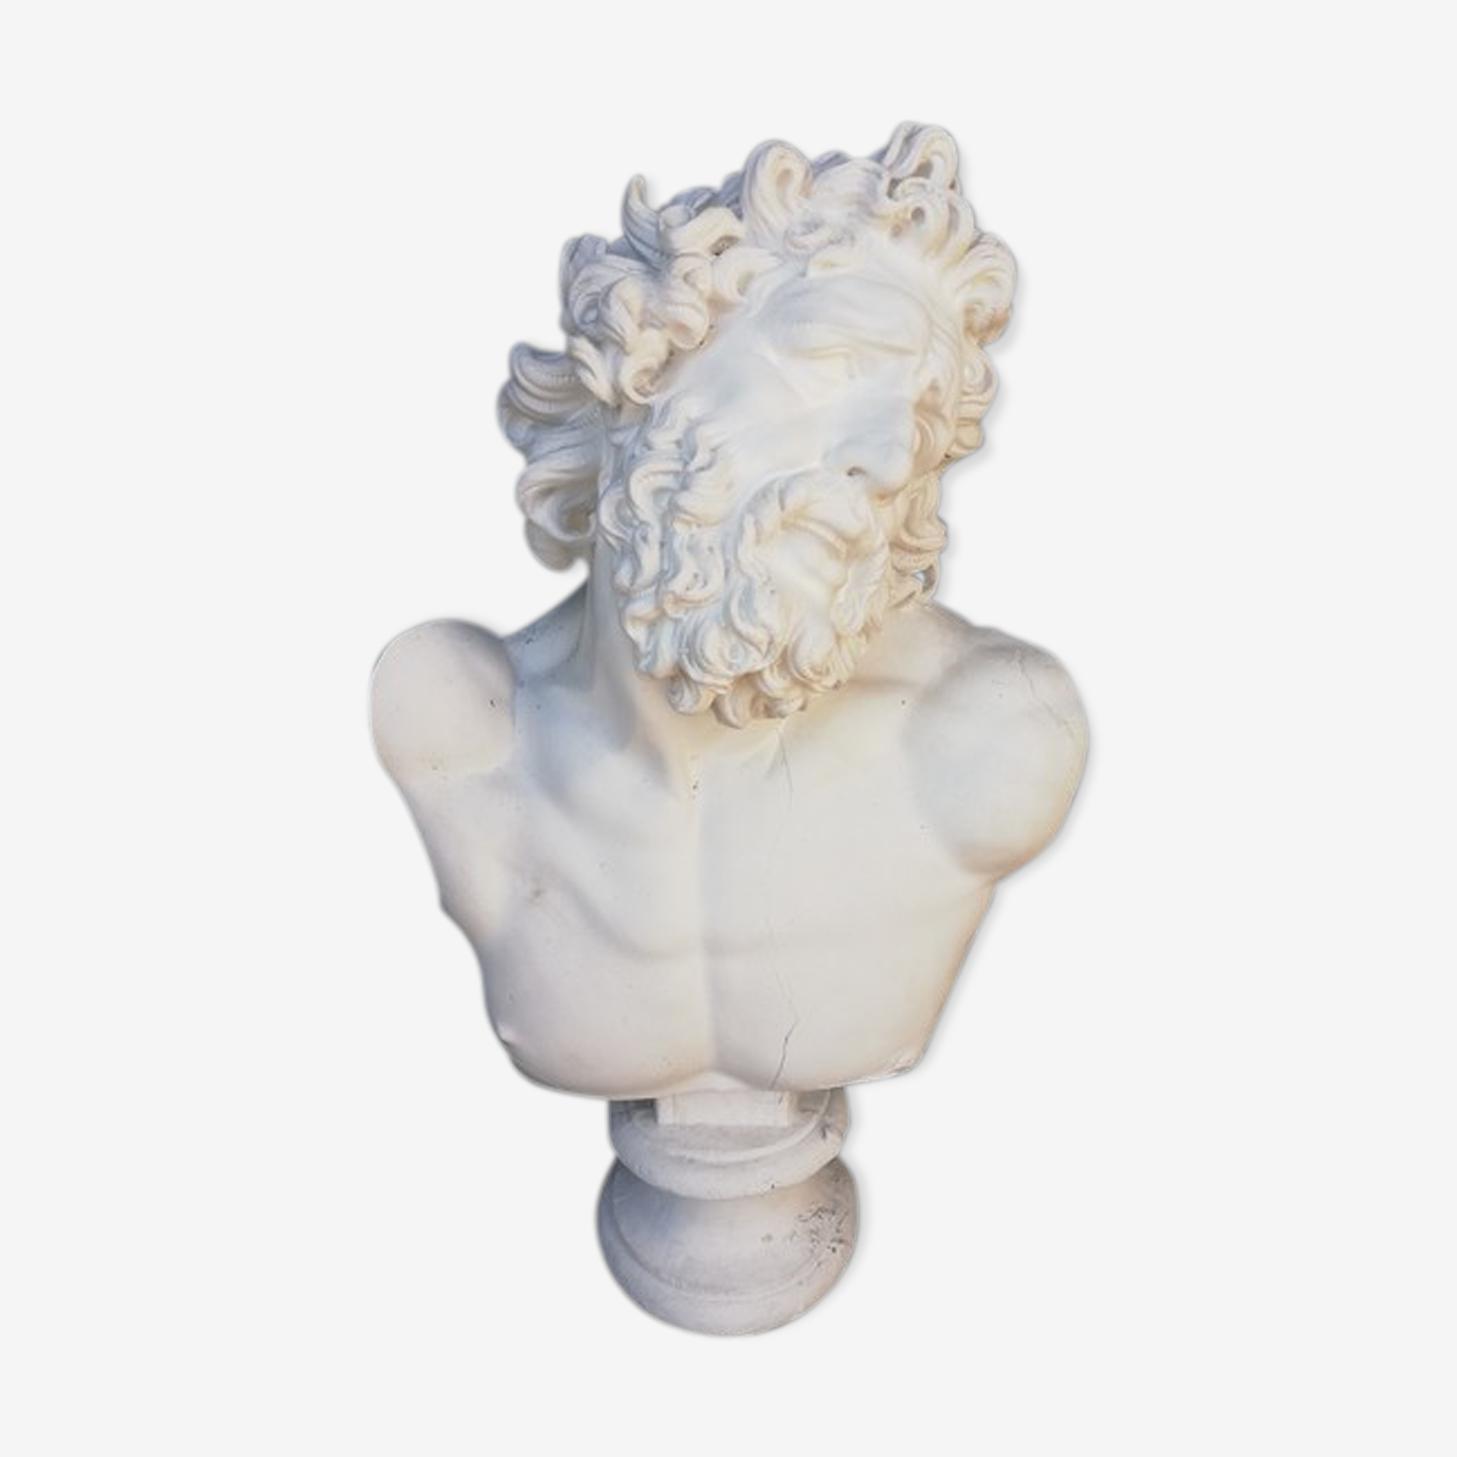 Posseidon plaster bust